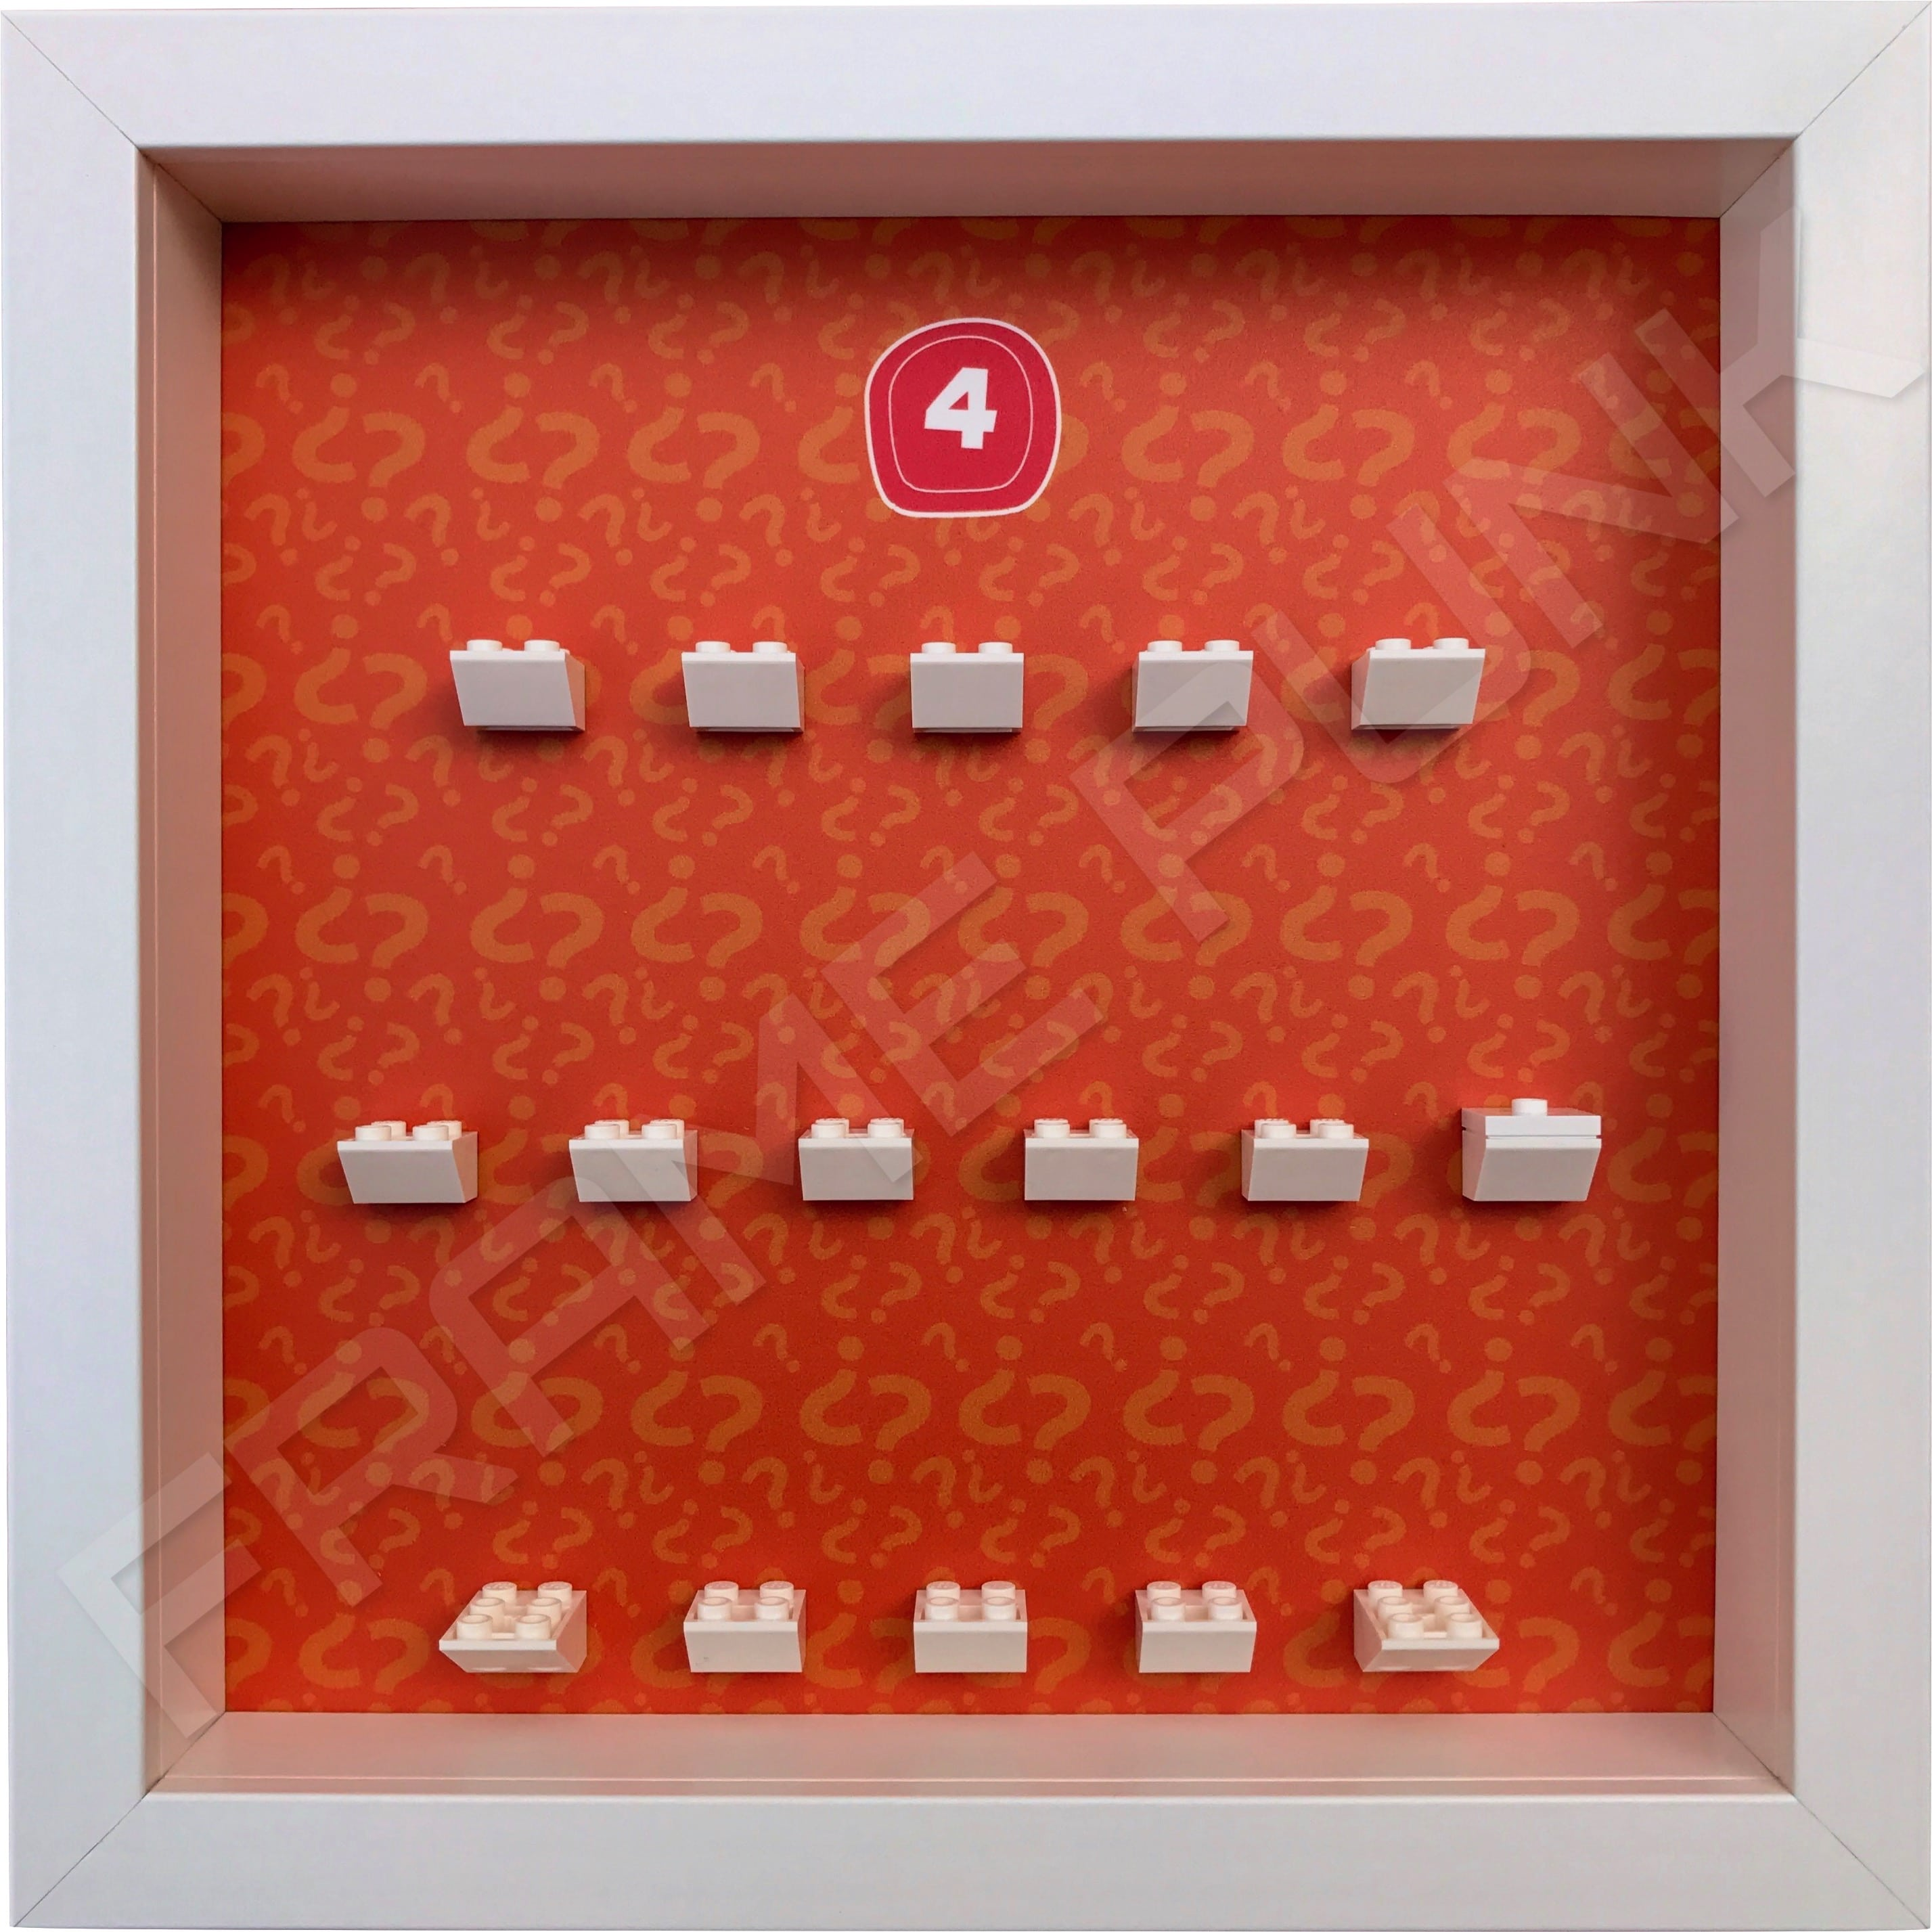 Lego minifigures series 4 display frame